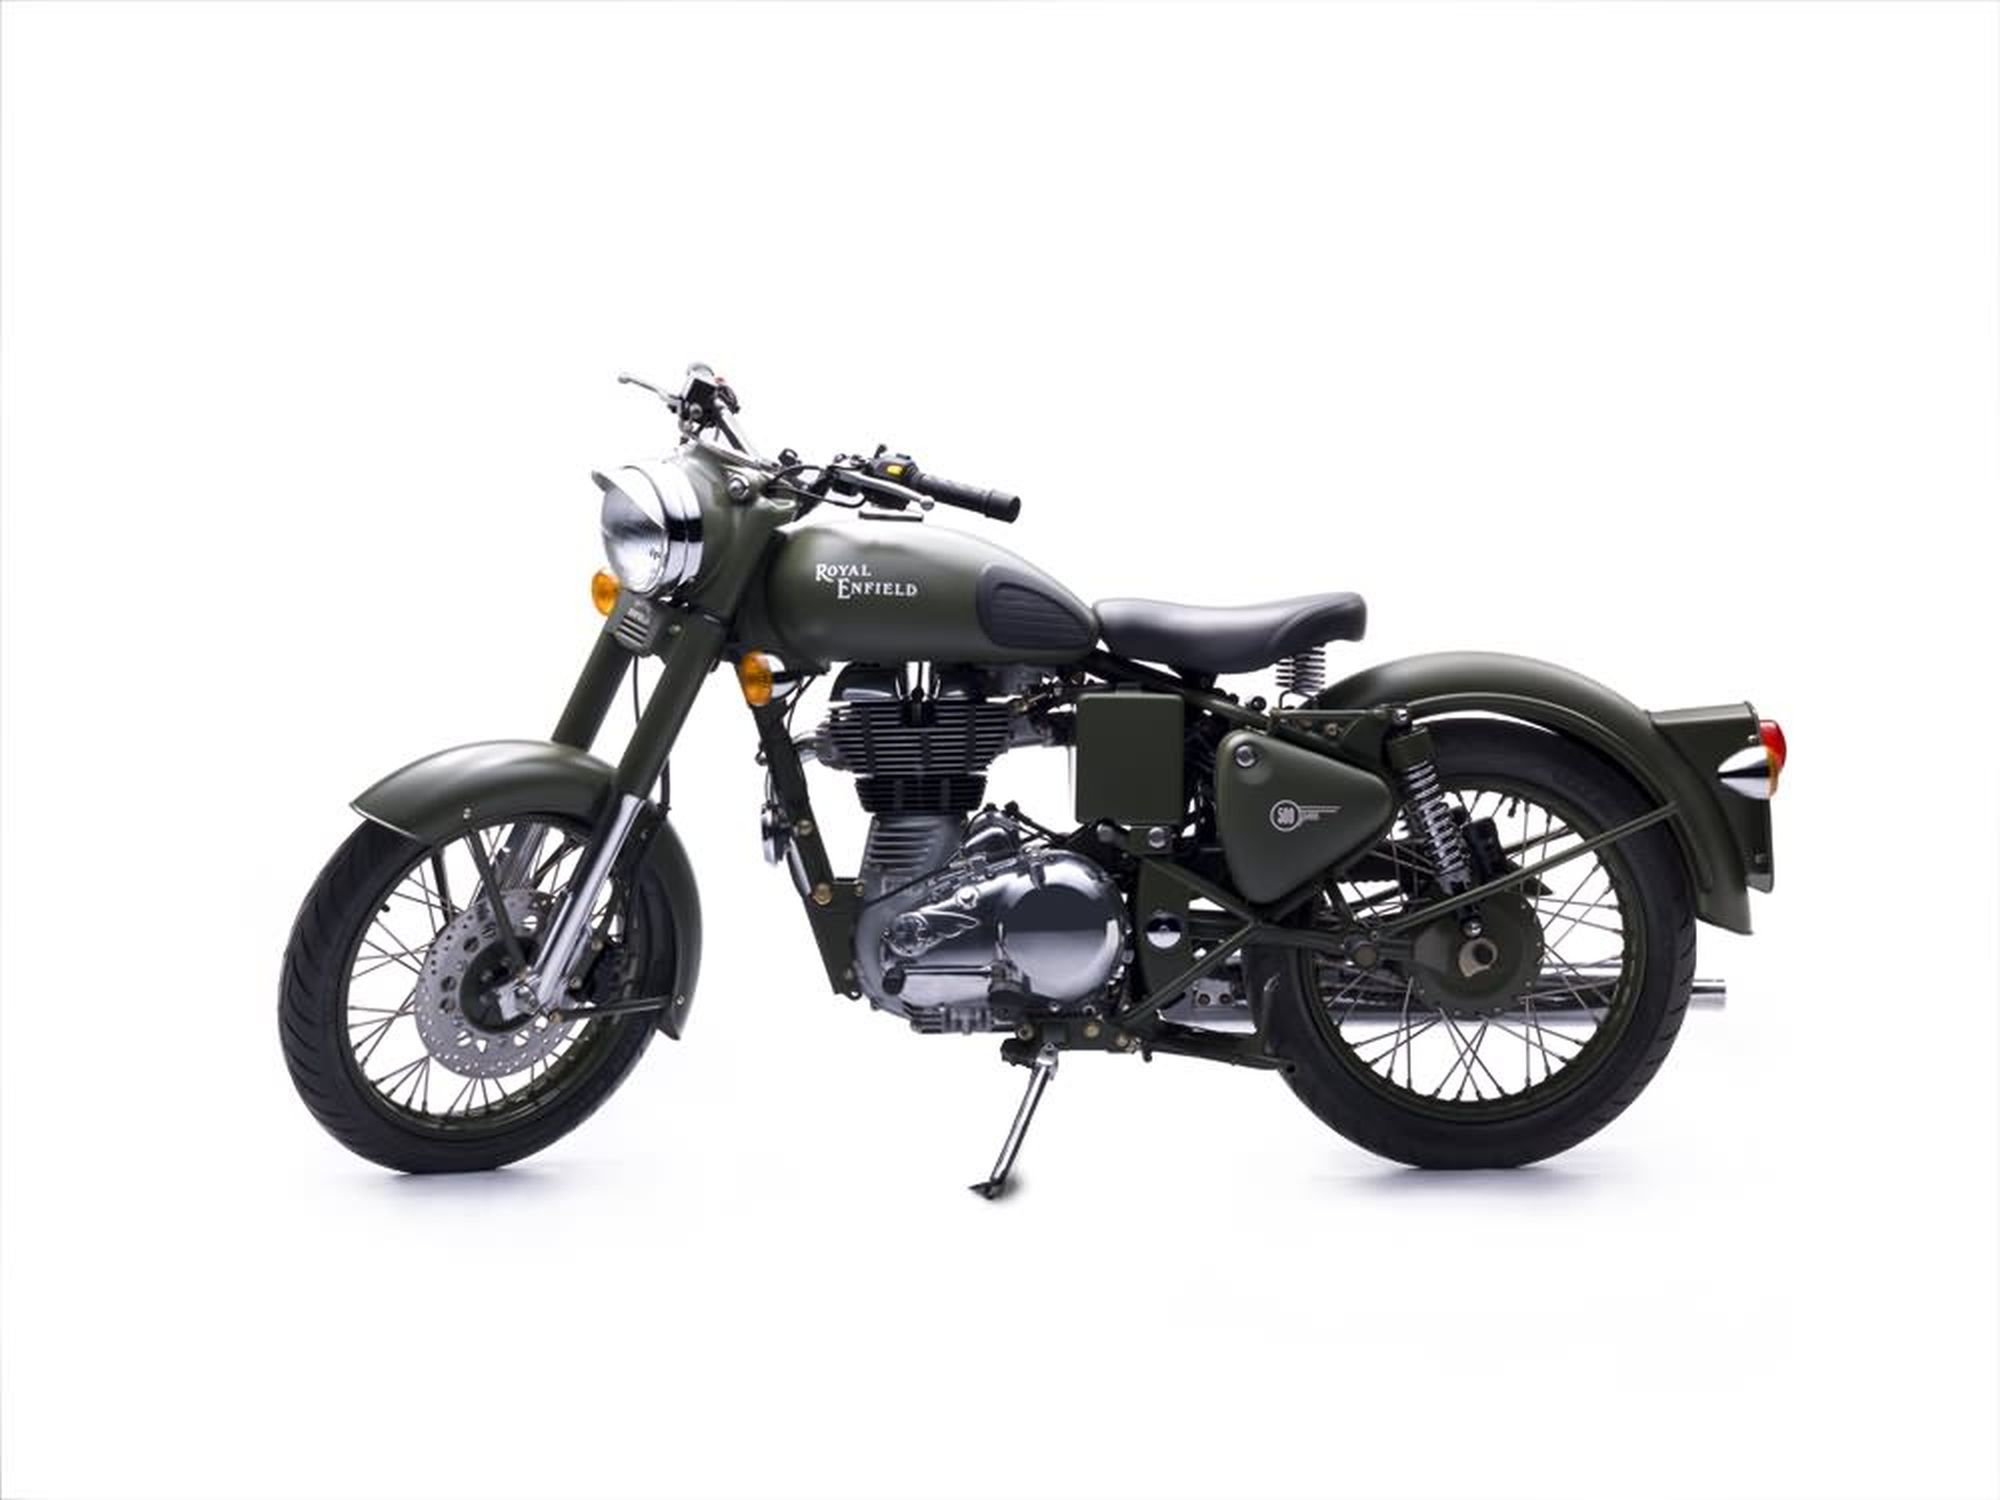 motorrad occasion royal enfield bullet 500 classic efi. Black Bedroom Furniture Sets. Home Design Ideas